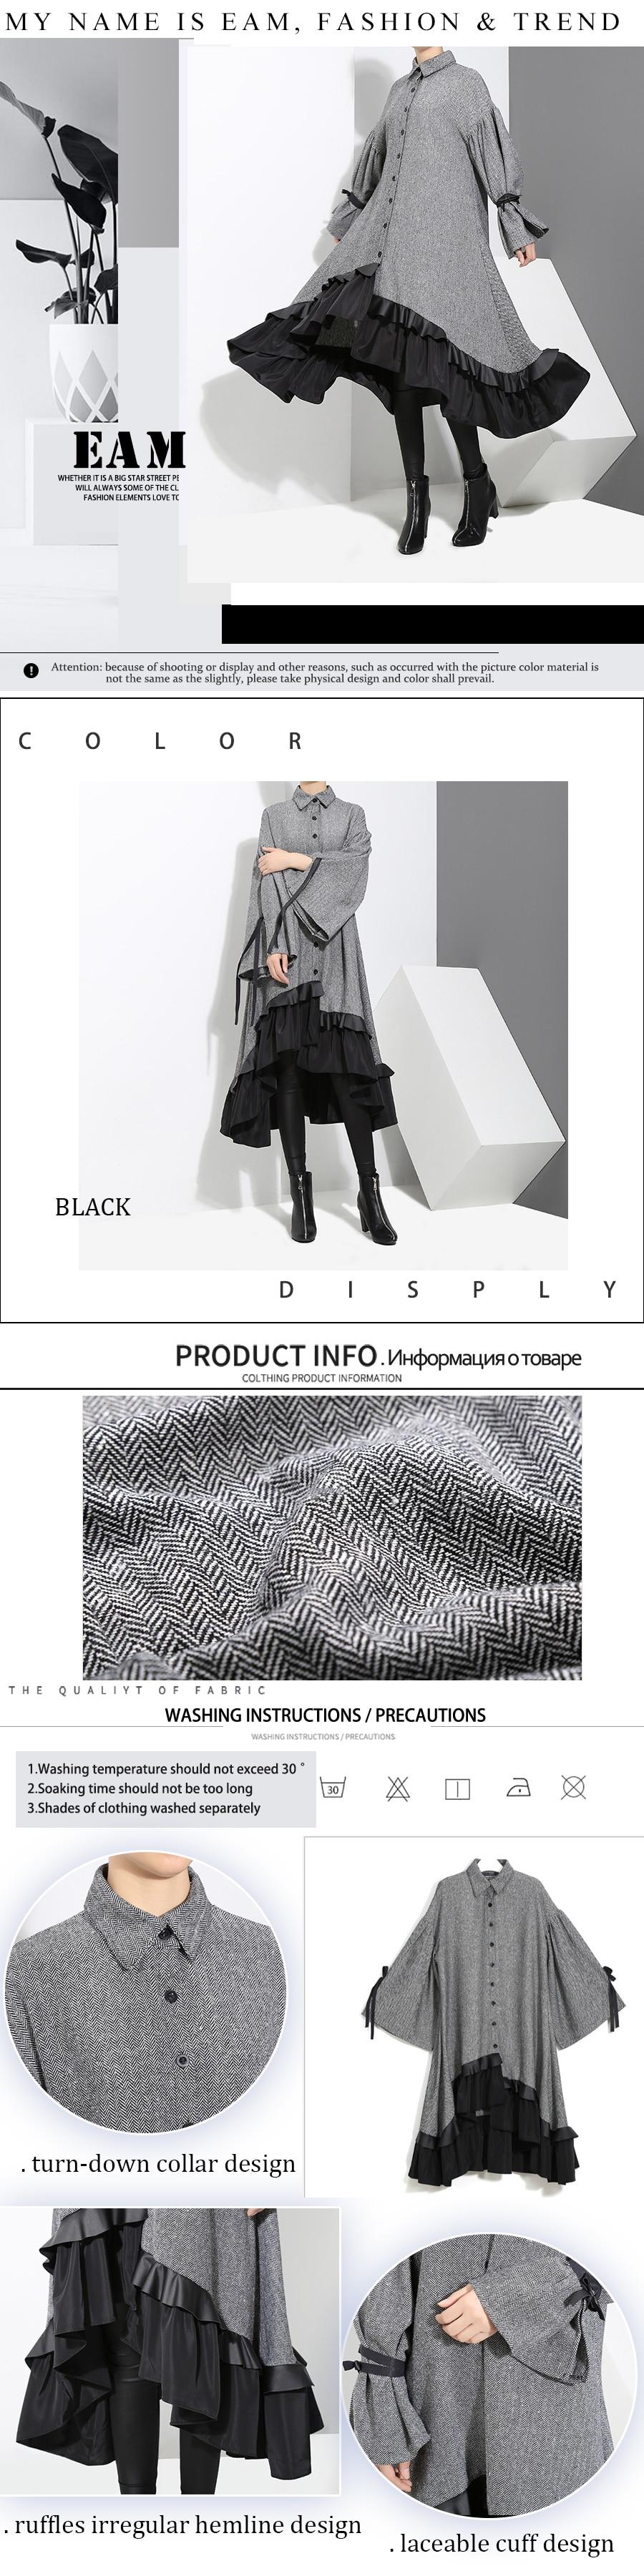 HTB1SeEtAA9WBuNjSspeq6yz5VXaT - [EAM] 2019 New Spring Lapel Long Sleeve  Bandage Solid Color Gray Big Hem Irregular Loose Dress Women Fashion Tide JD717